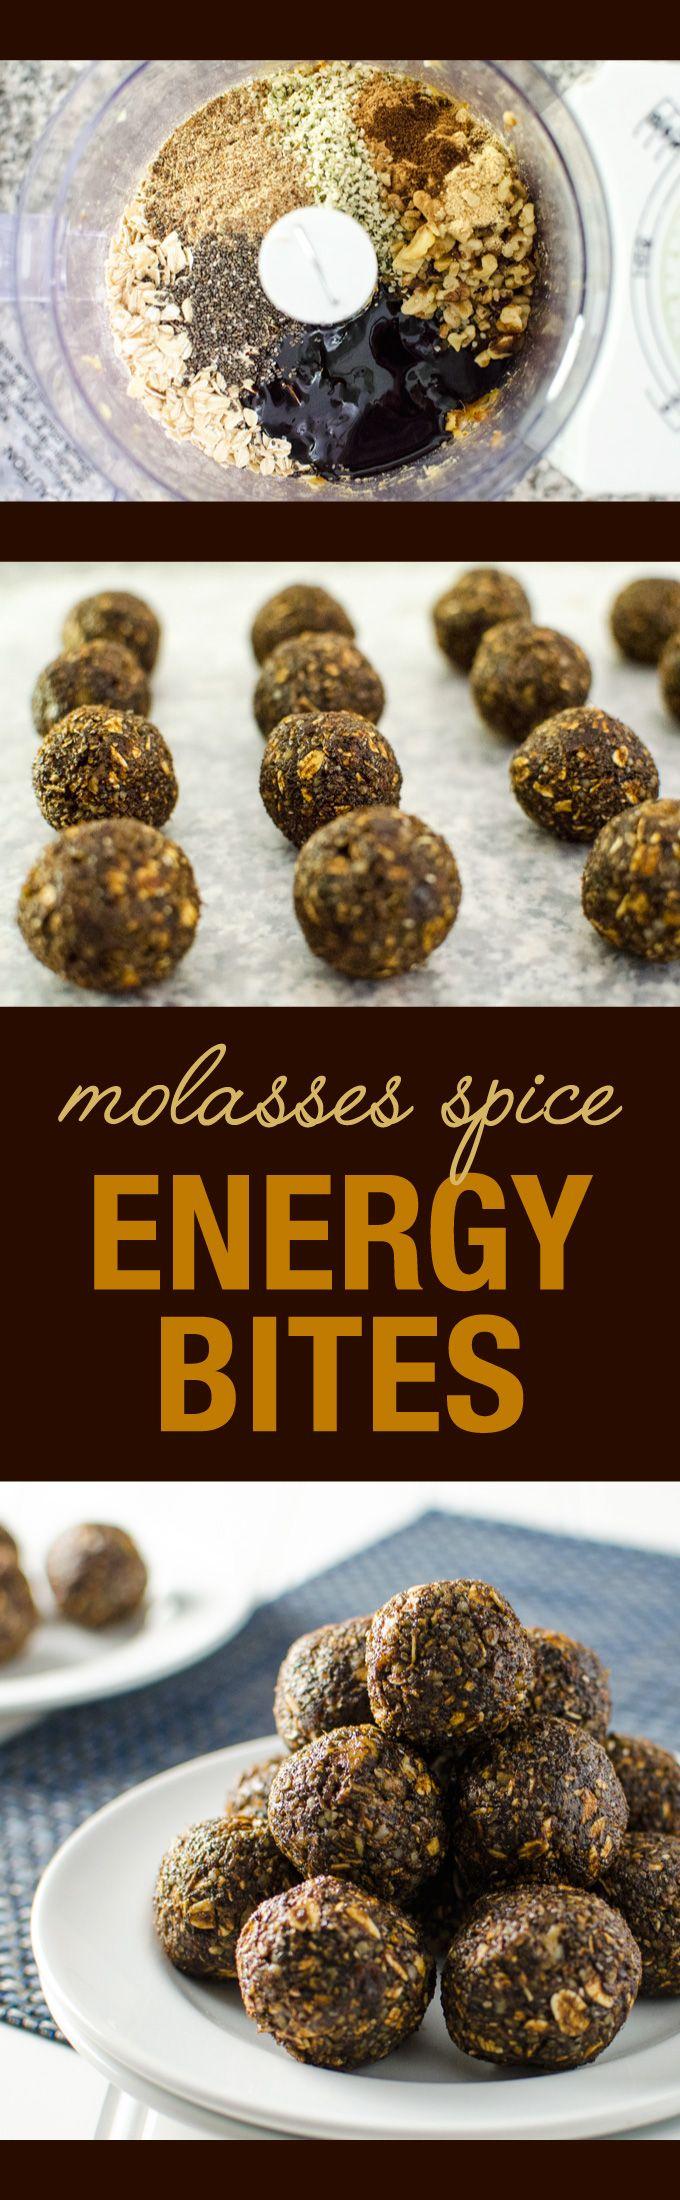 Molasses Spice Energy Bites - a yummy vegan and gluten free snack recipe | VeggiePrimer.com